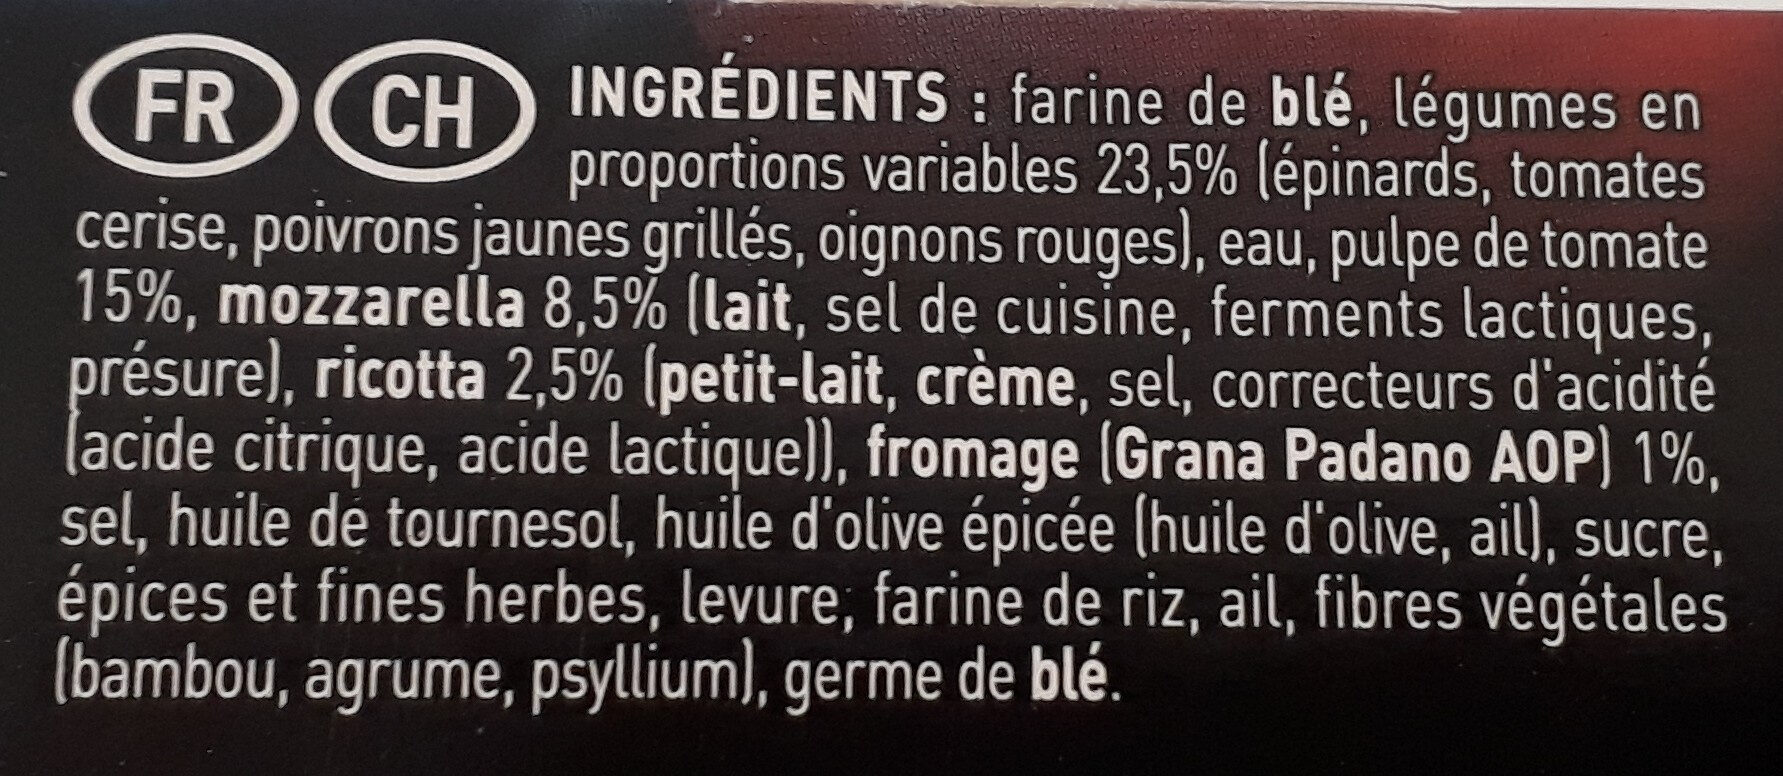 Bella Napoli verdure - Ingrédients